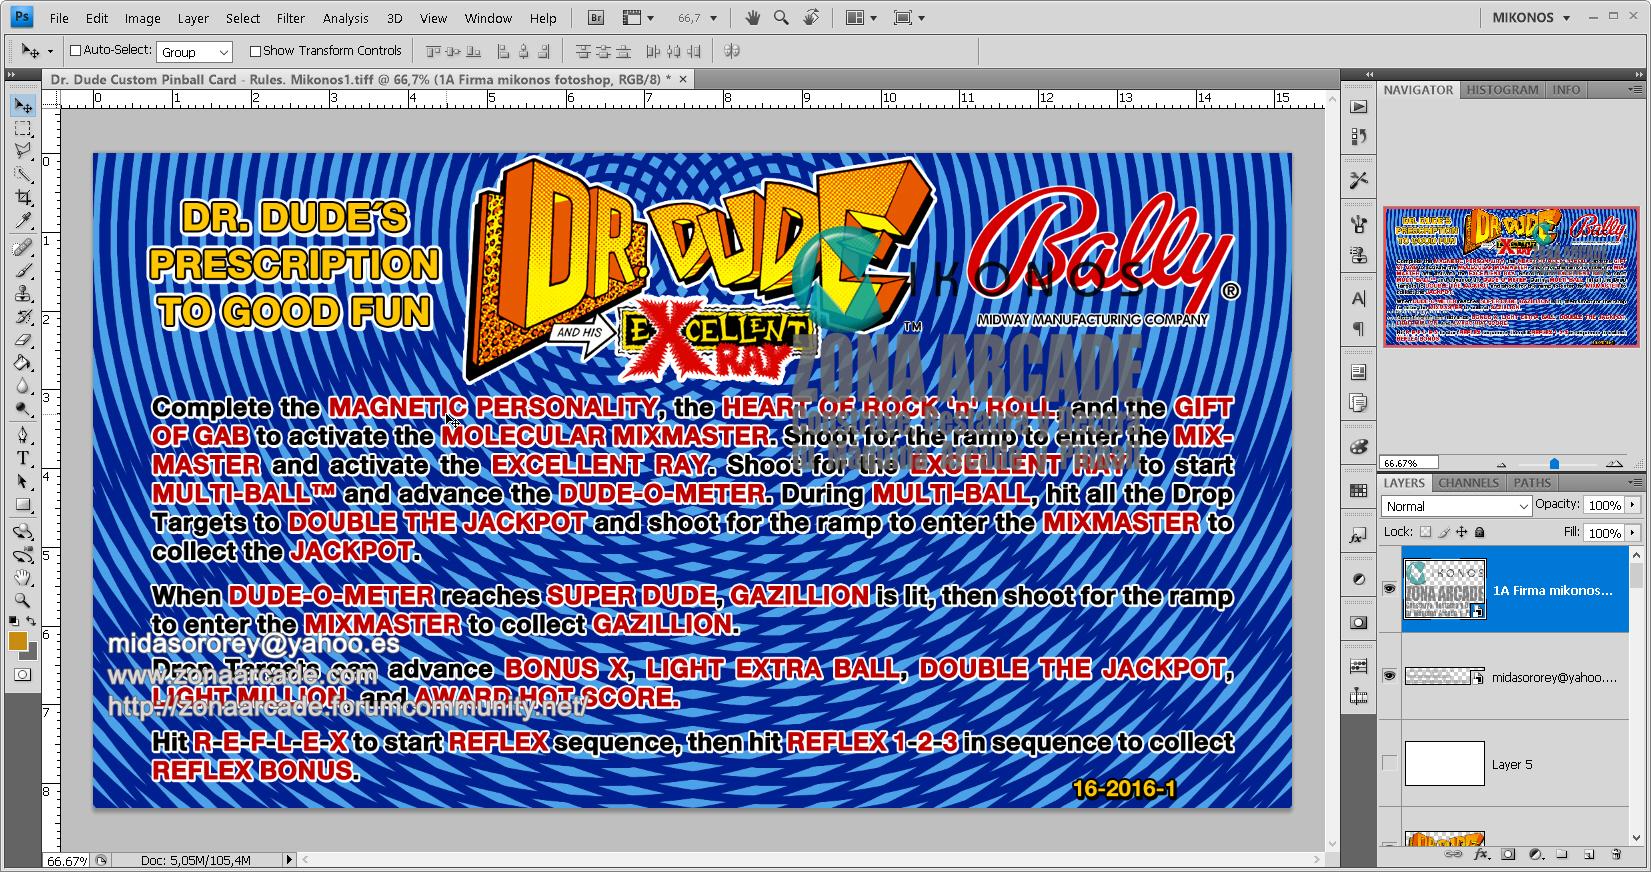 dr.%20Dude%20Pinball%20Card%20Customized%20-%20Rules2.%20Mikonos1.jpg